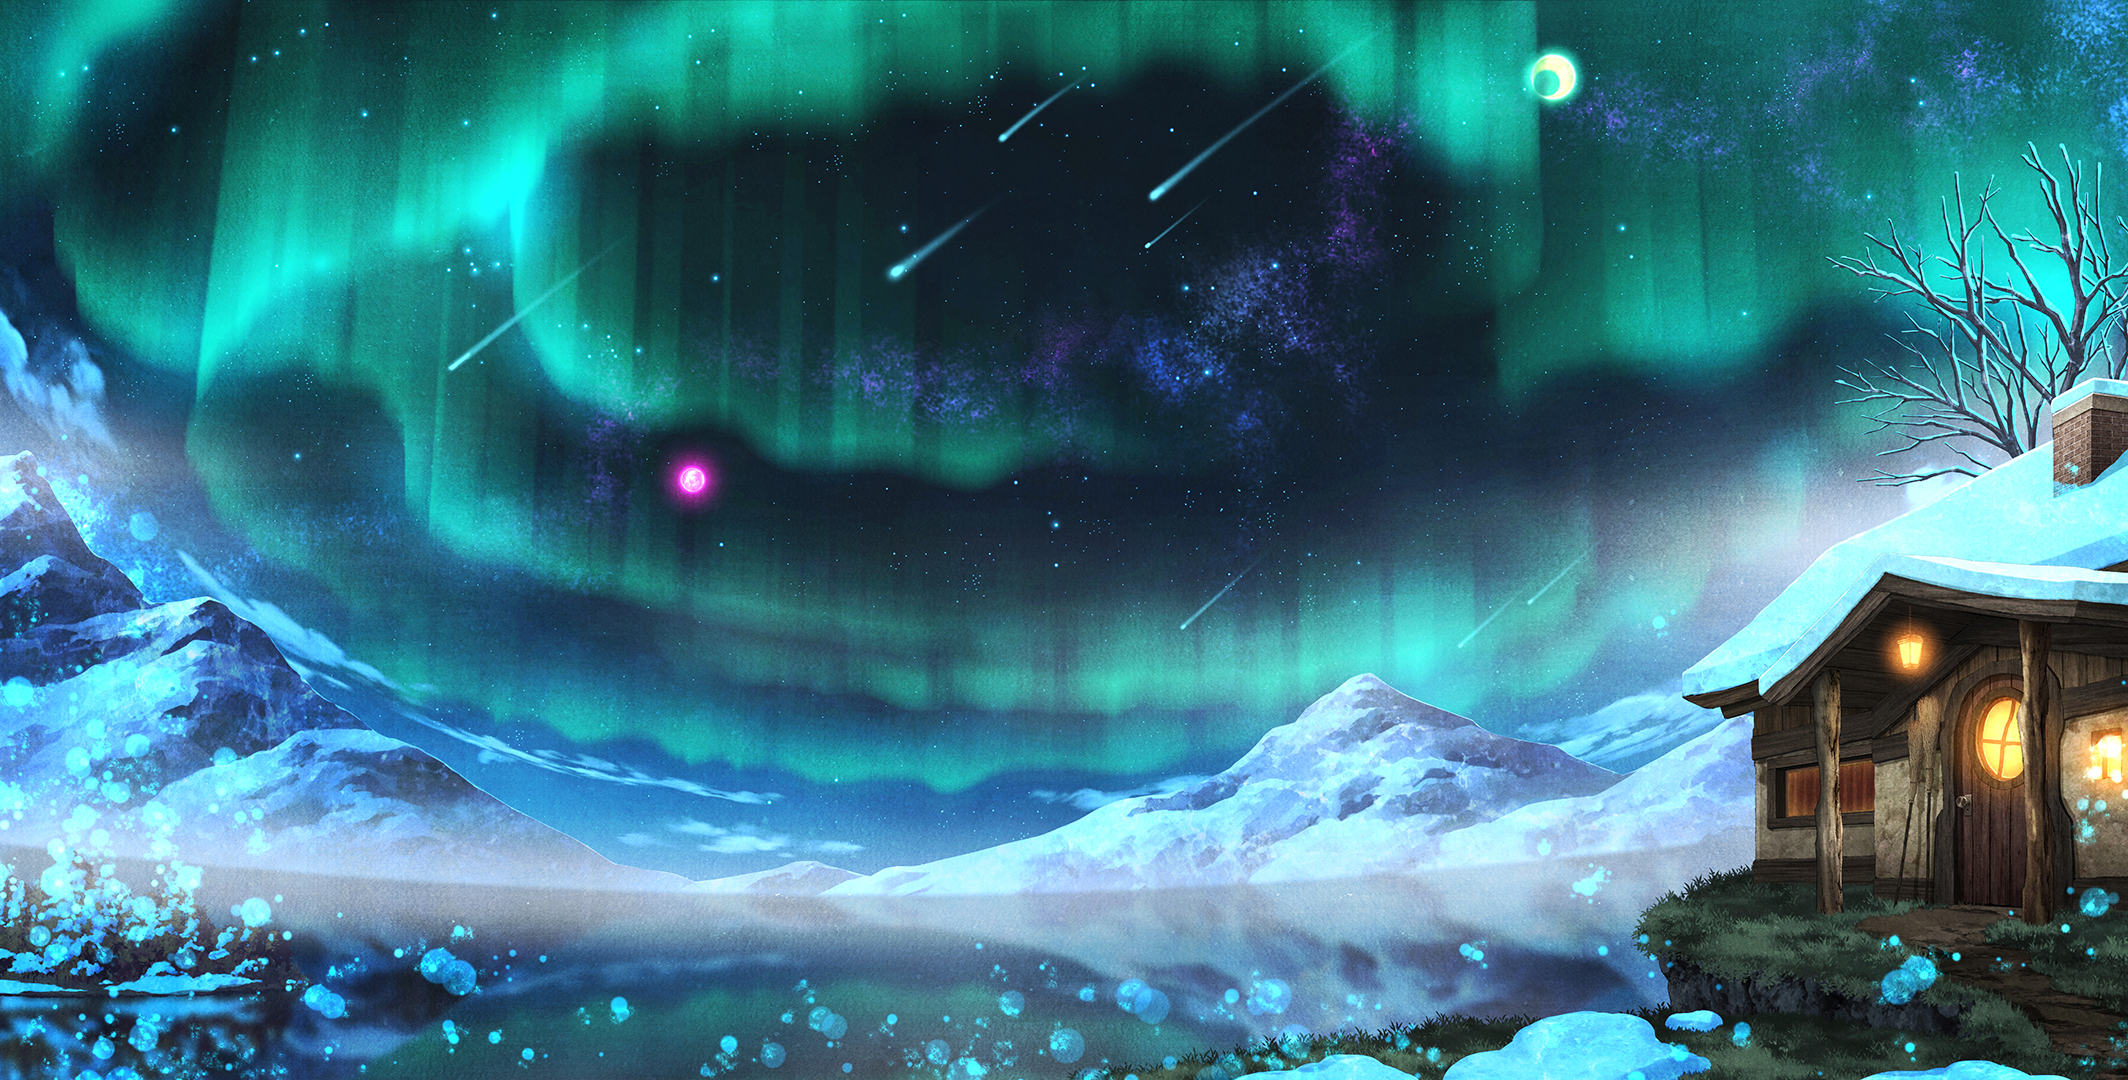 Shooting Star Snow Wallpapers ID933598